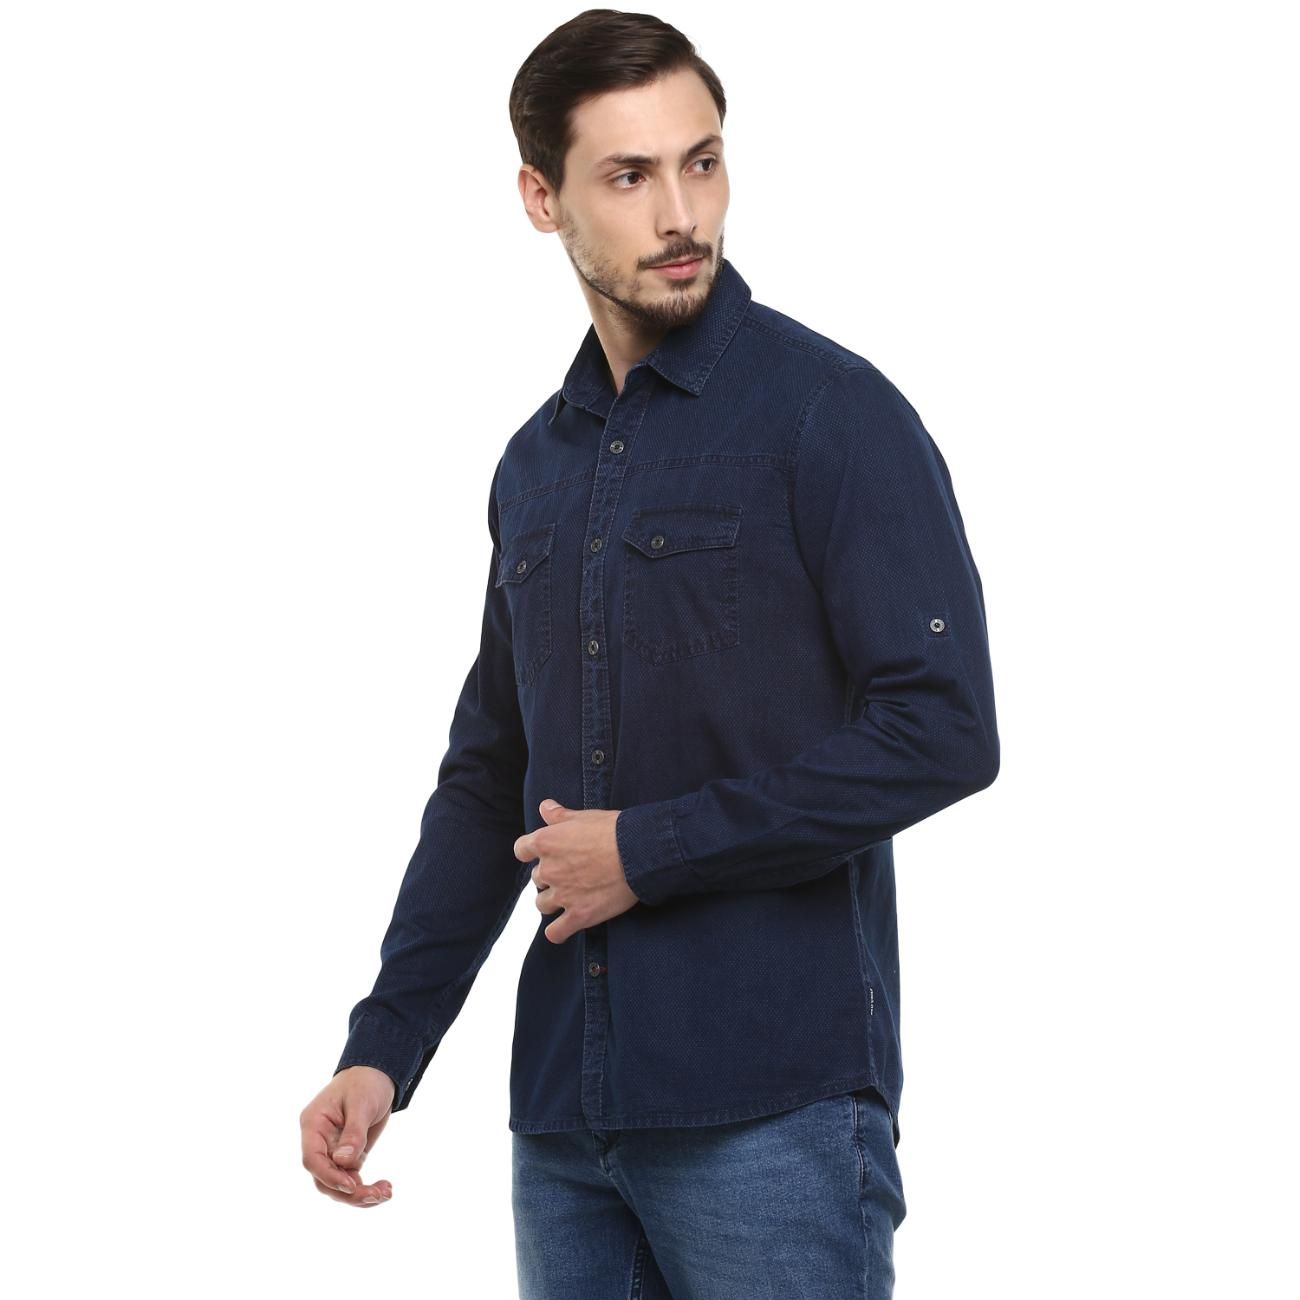 Plain Shirts for Men